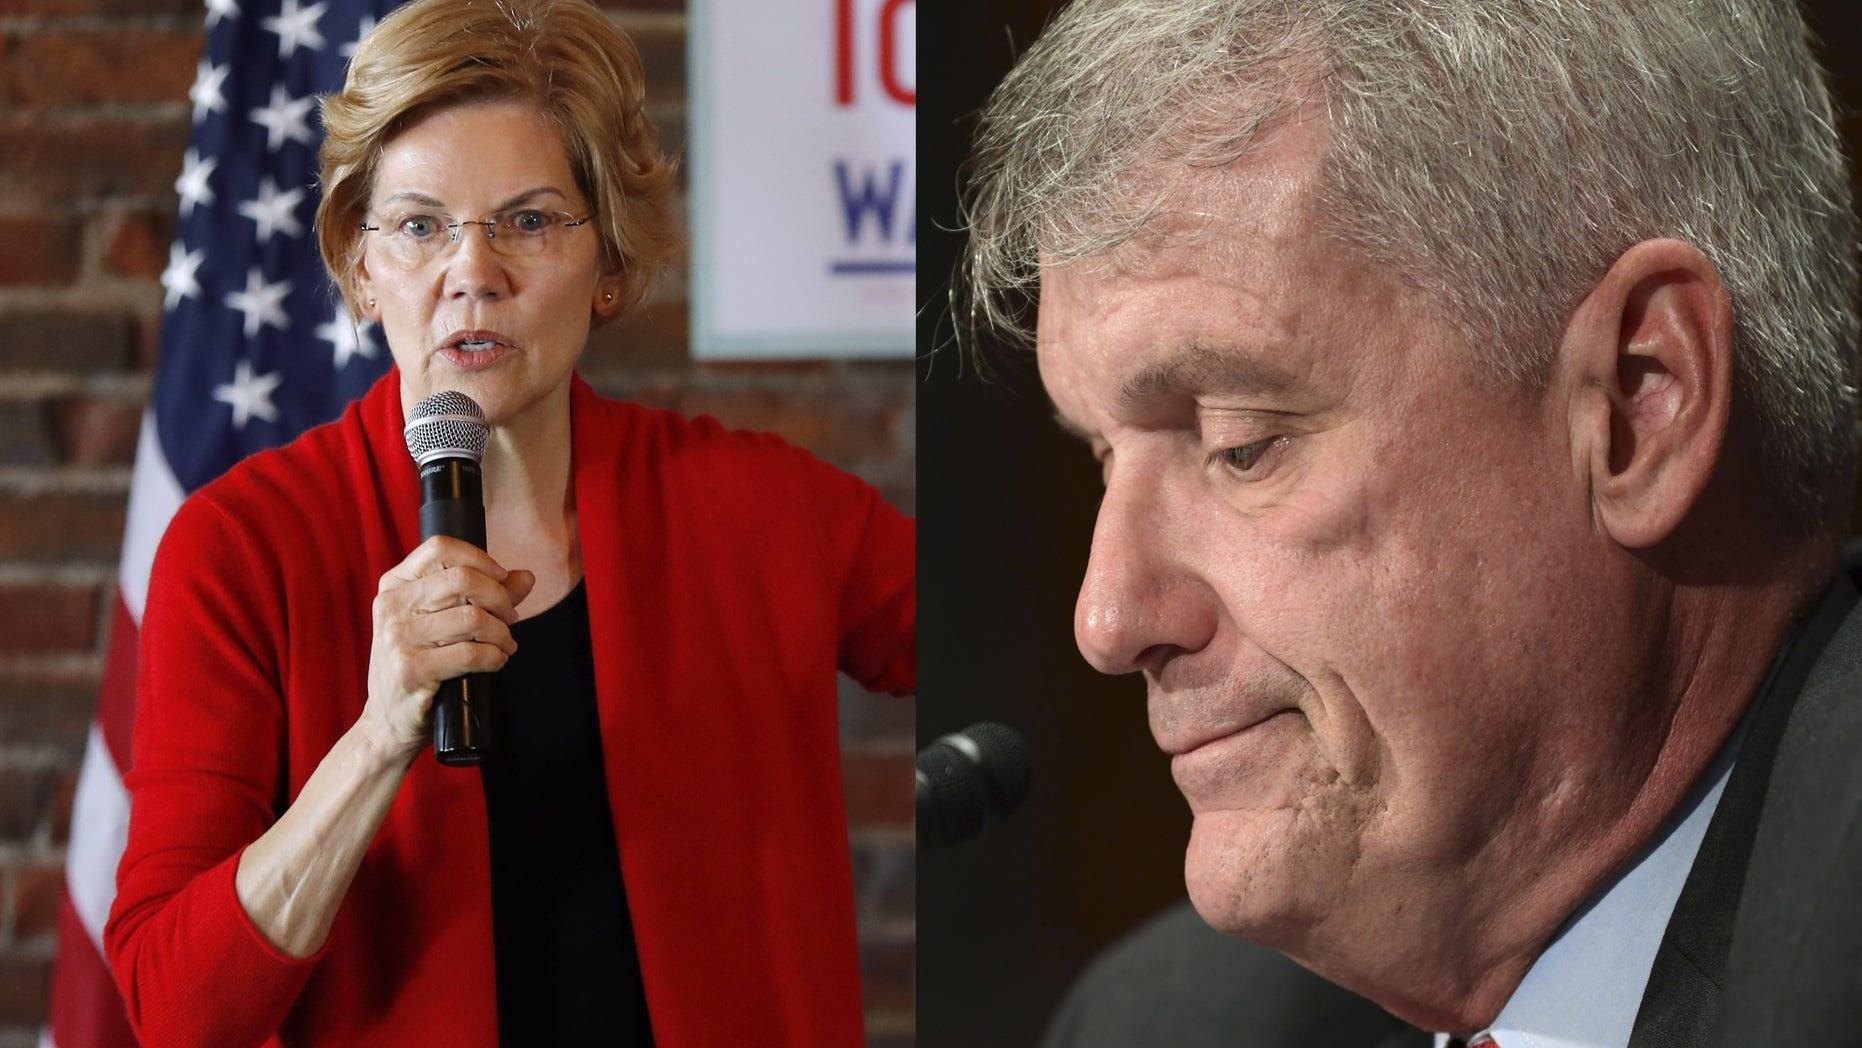 Sen. Elizabeth Warren, D-Mass., cheered at news that Wells Fargo CEO Tim Sloan announced his resignation Thursday.